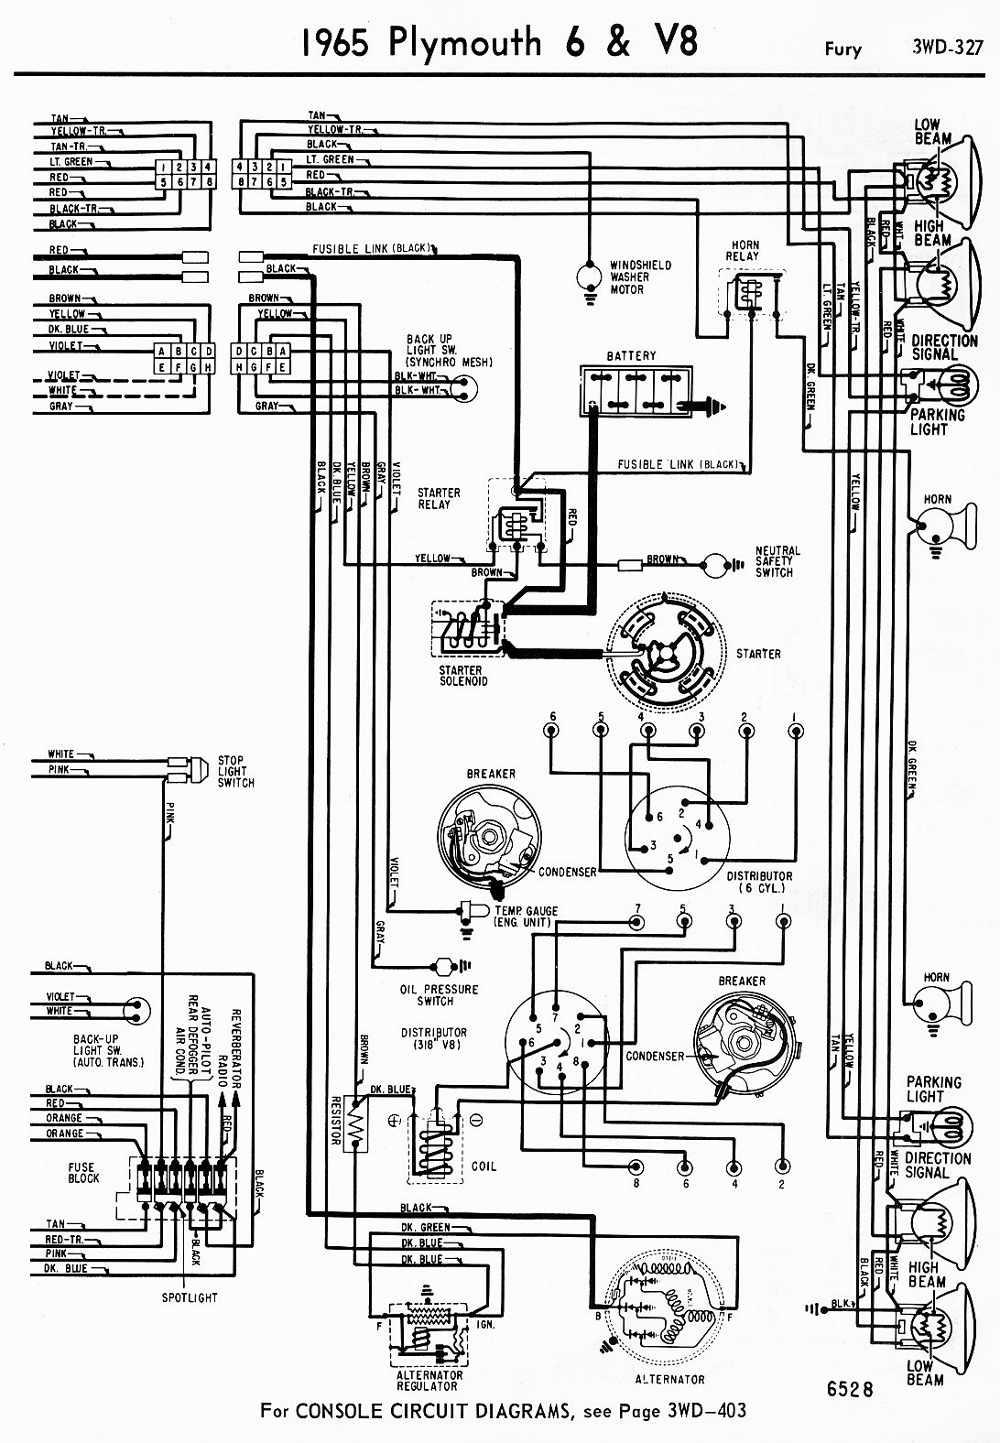 1973 ford maverick fuse box 1973 chevrolet camaro fuse box 1970 plymouth barracuda 1964 plymouth barracuda [ 1000 x 1443 Pixel ]